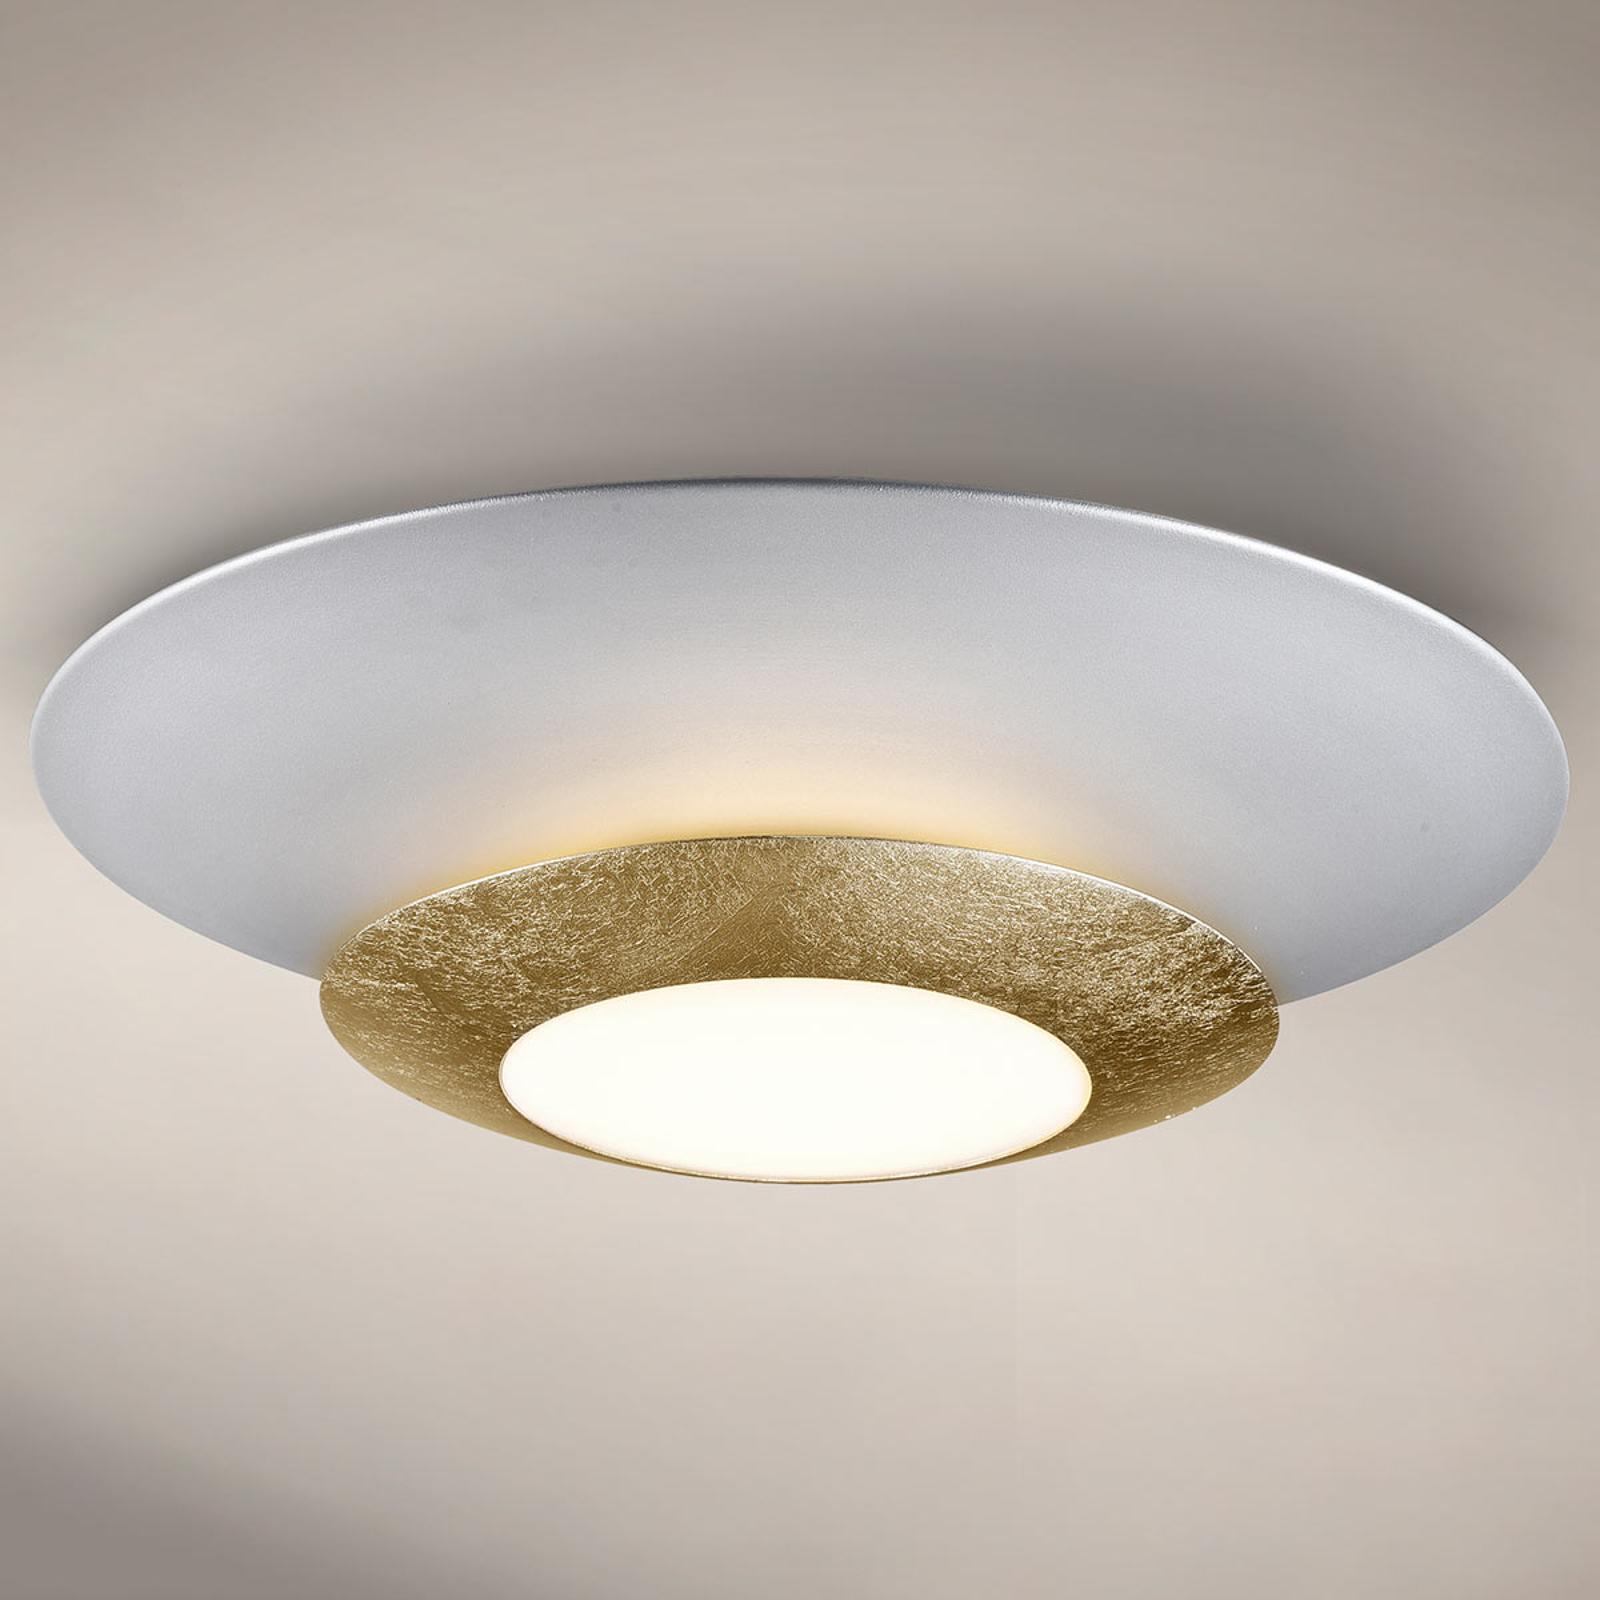 Ronde LED plafondlamp Hole met goudfolie